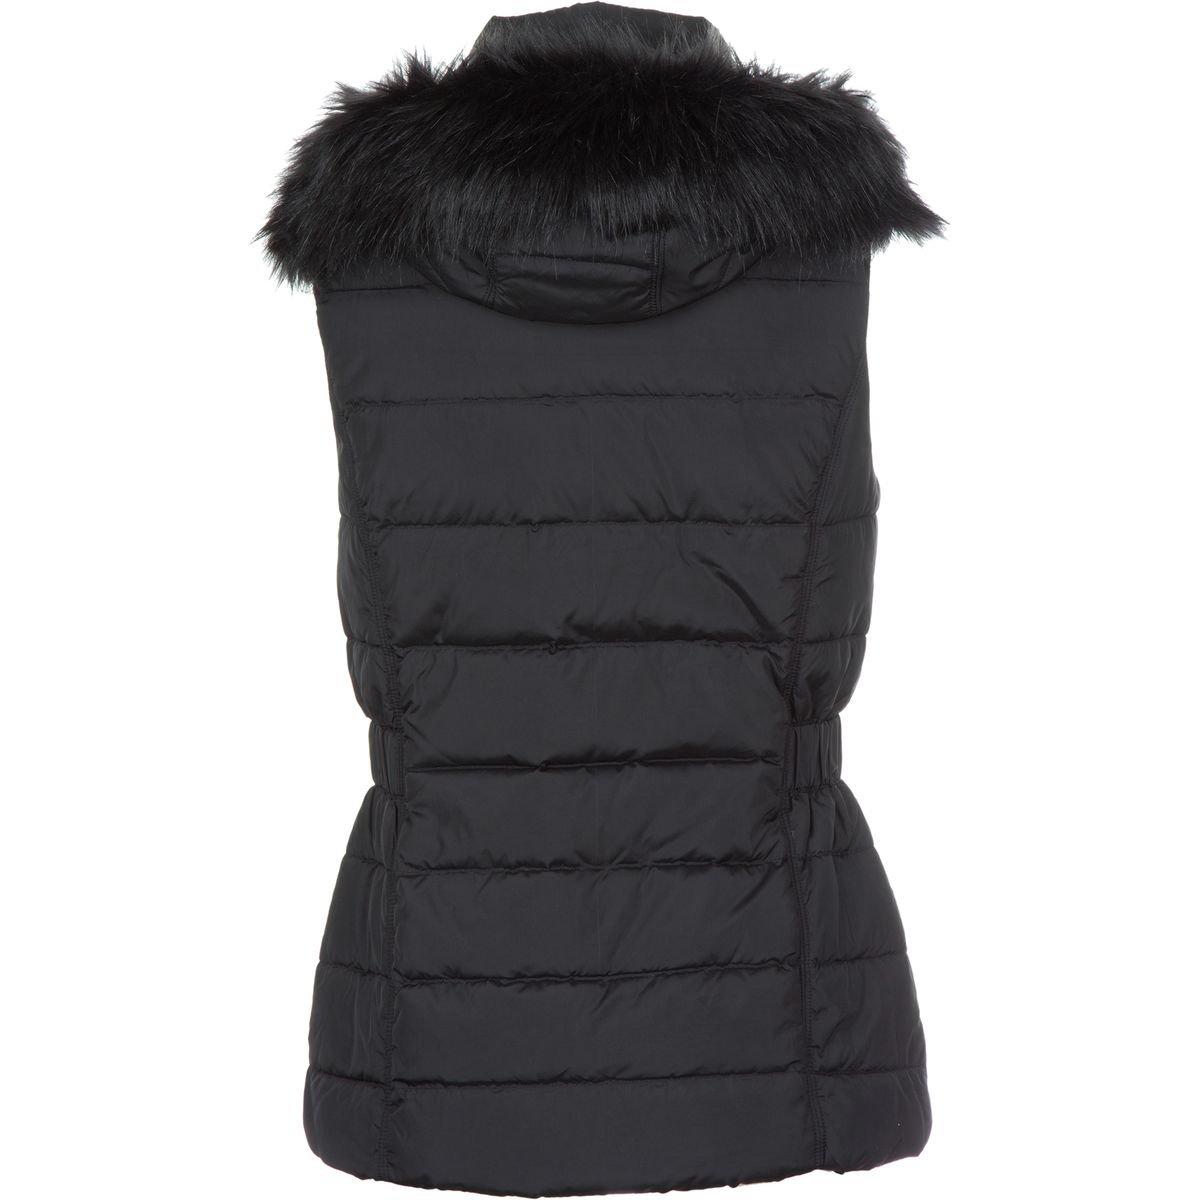 102fa58a3 The North Face Women's Gotham Vest